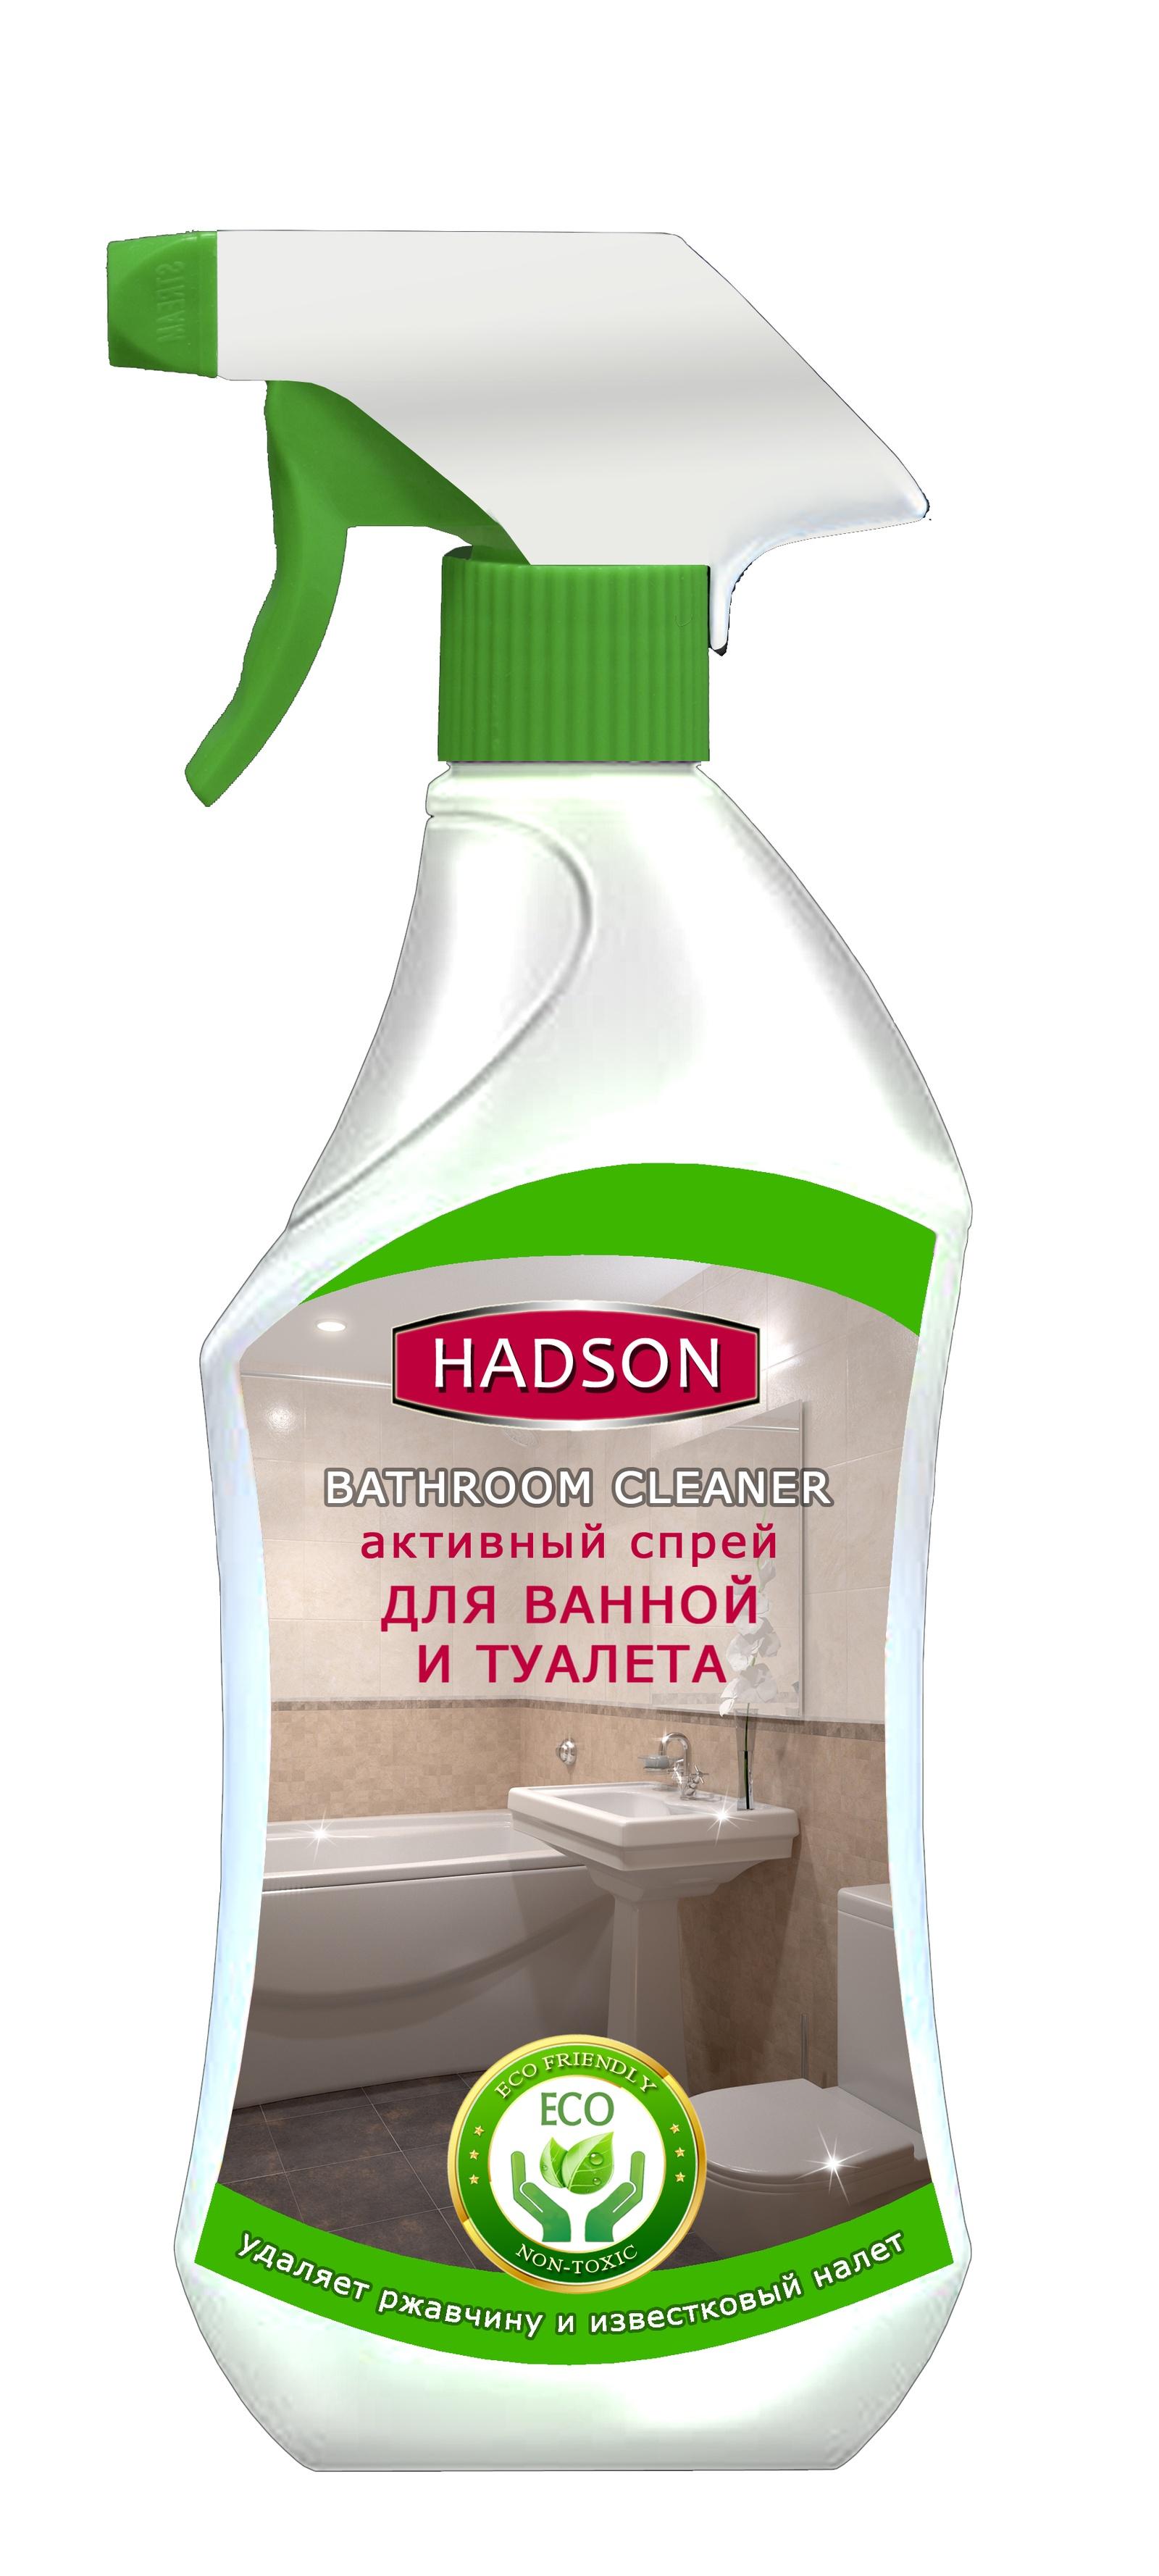 Средство для ванной и туалета HADSON ЭКО, 500 мл, Активный спрей nagara средство для очистки туалета 500 мл